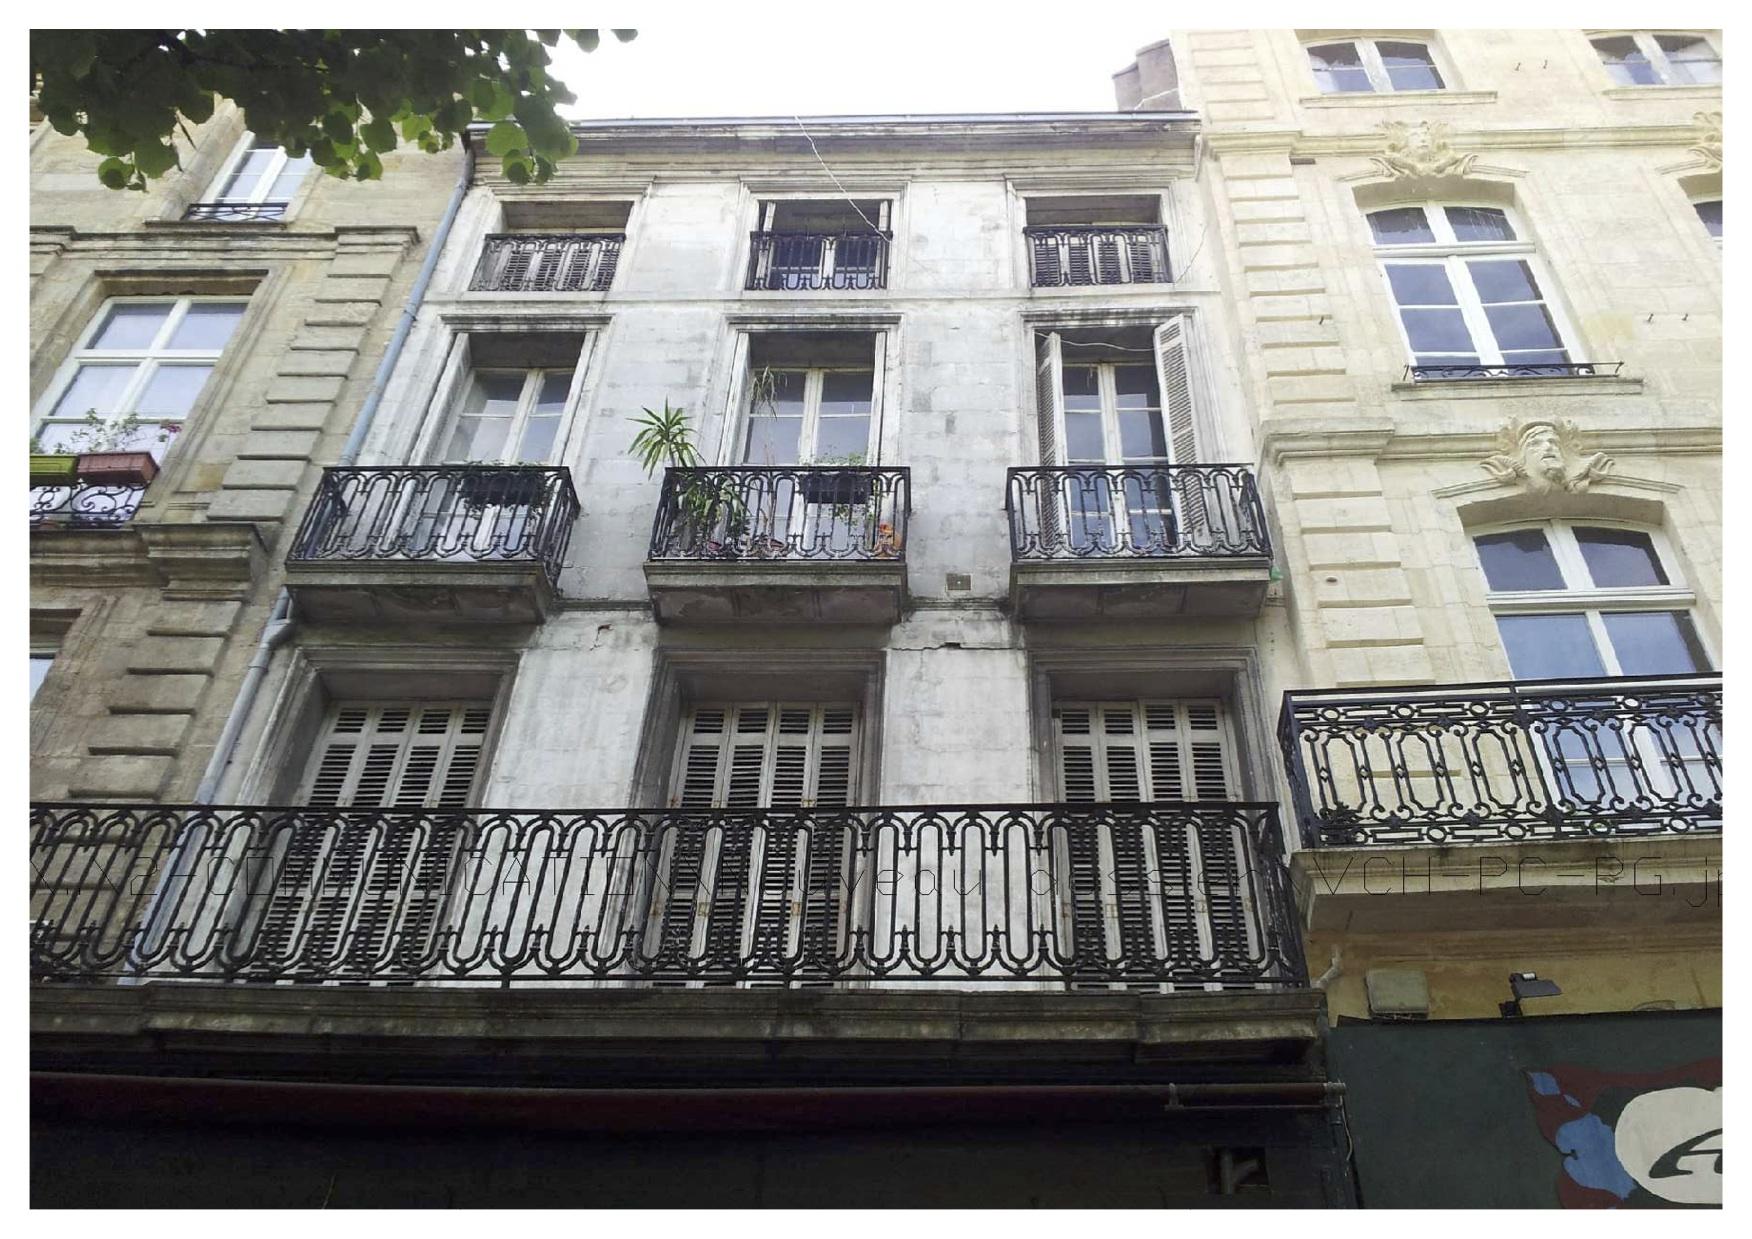 Facade Malraux Bordeaux cours Victor Hugo